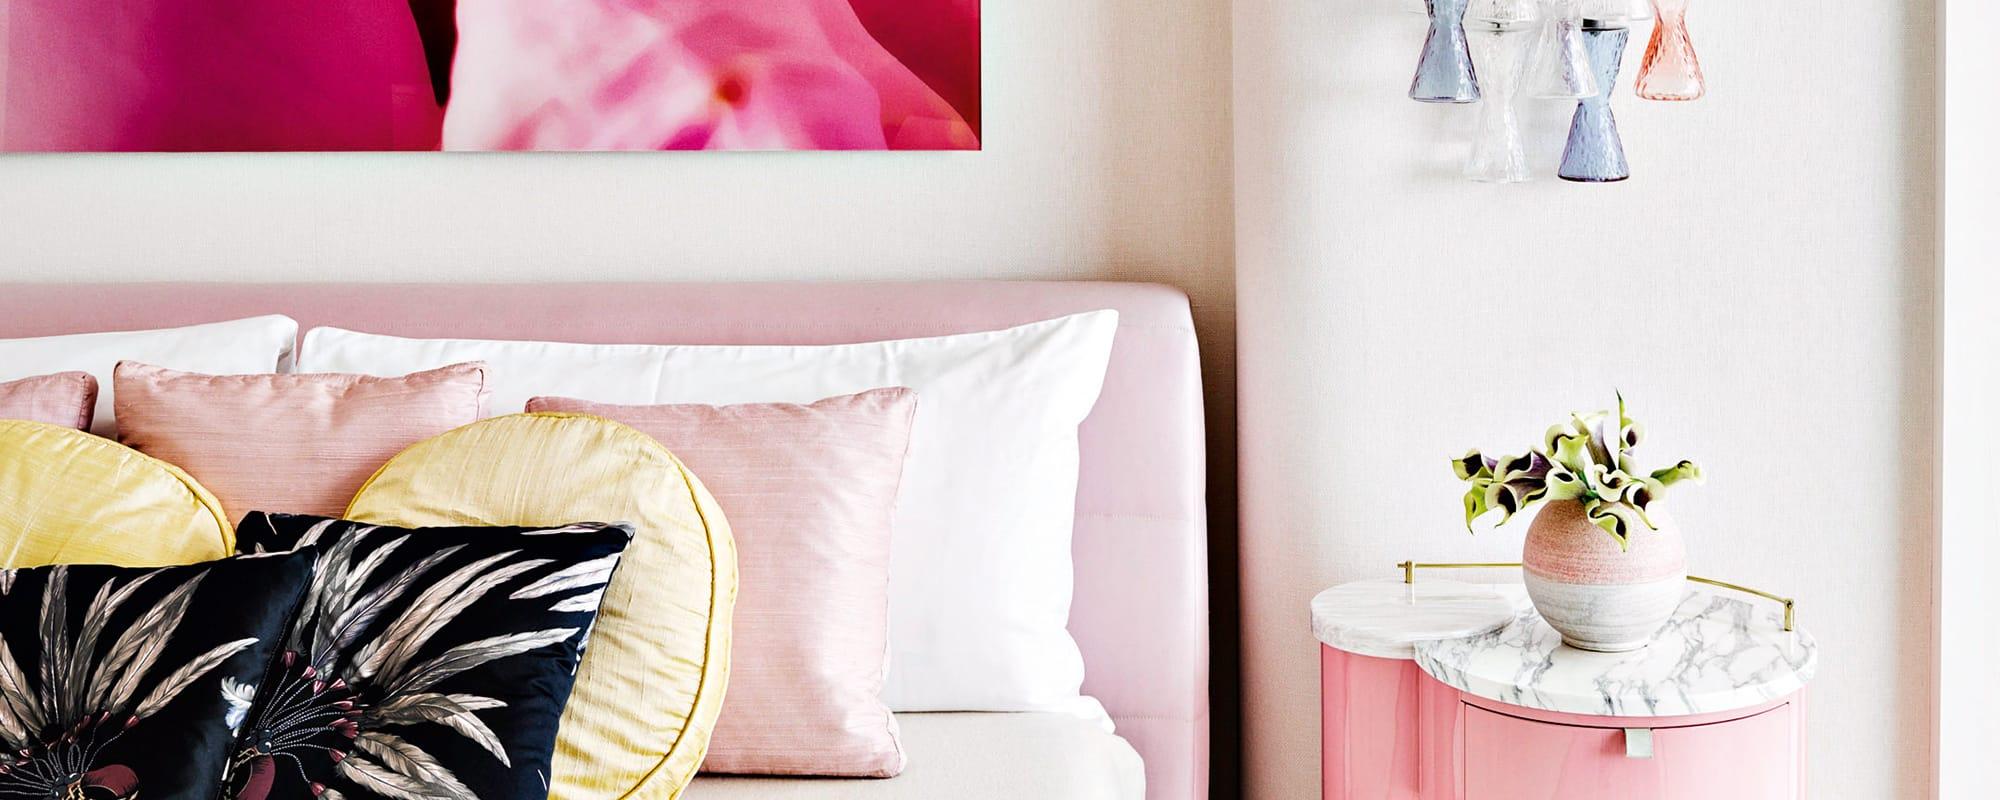 Bryan Graybill, Haus, pink